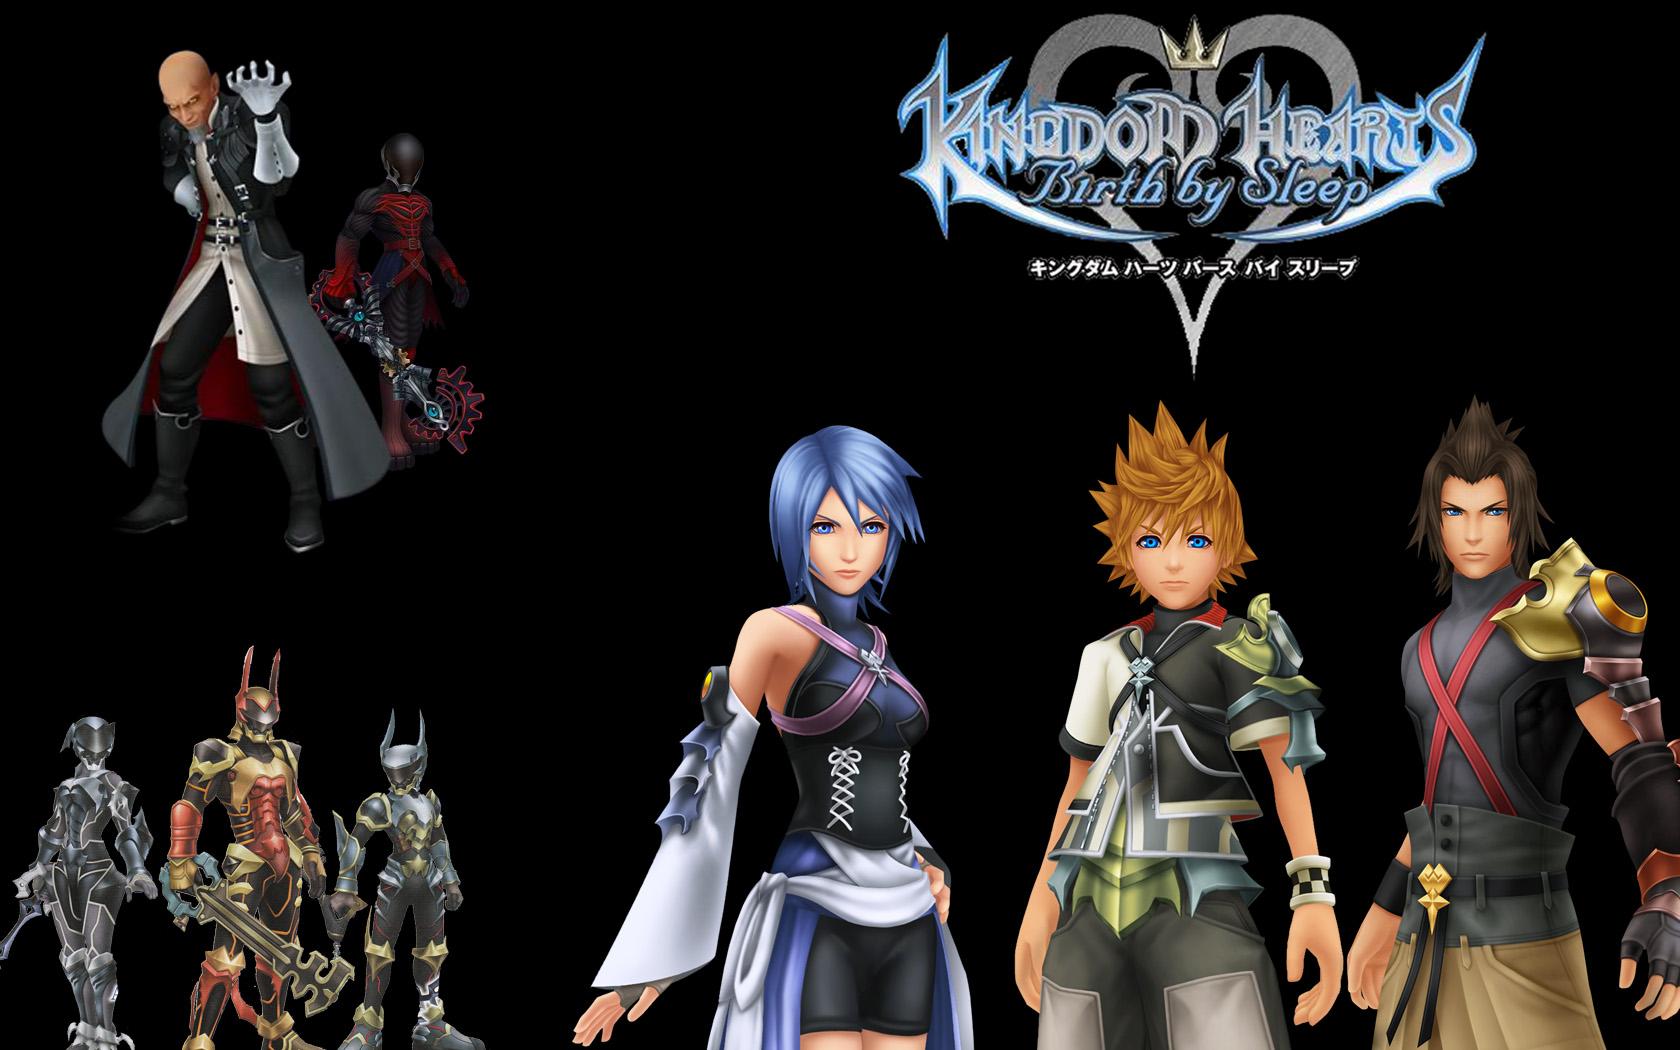 Kingdom Hearts 3 Wallpaper For Desktop 1680x1050